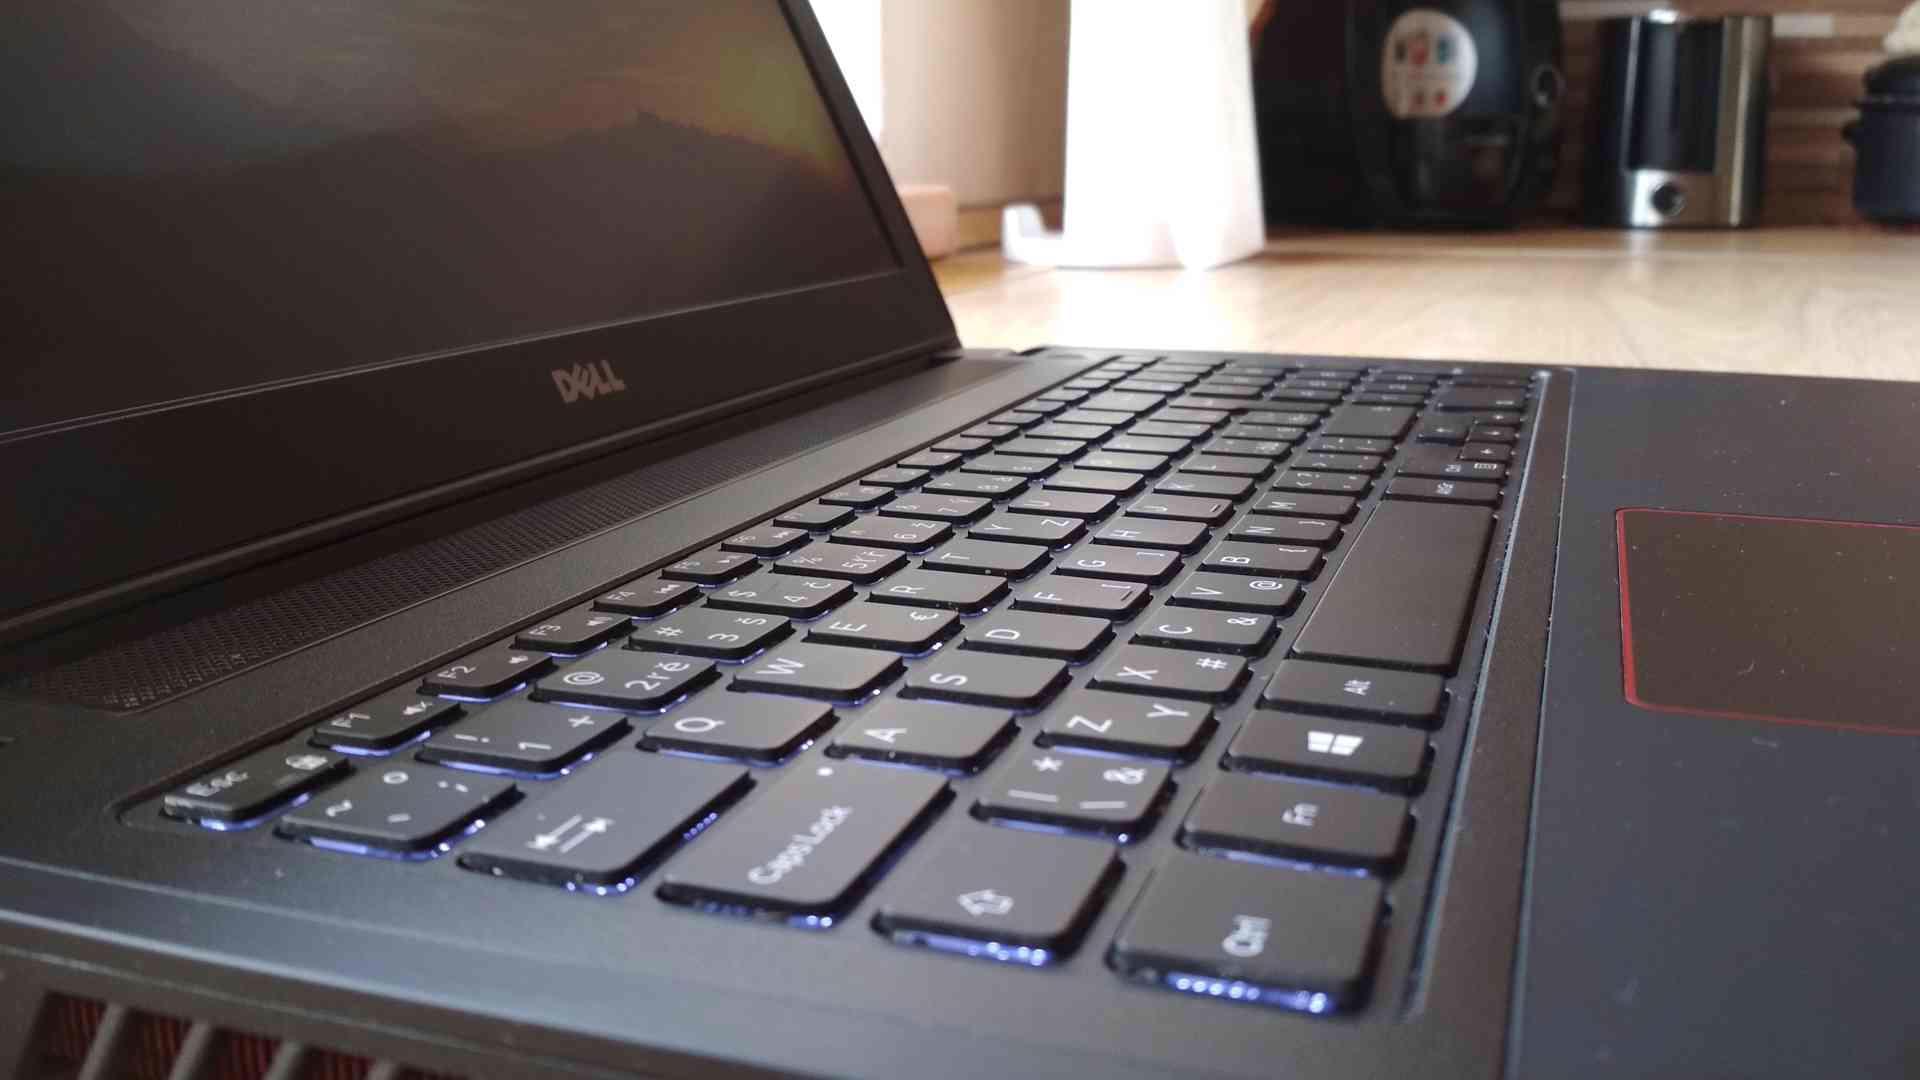 Herní notebook Dell Inspiron 15, i5, GTX960m, 8GB - foto 1